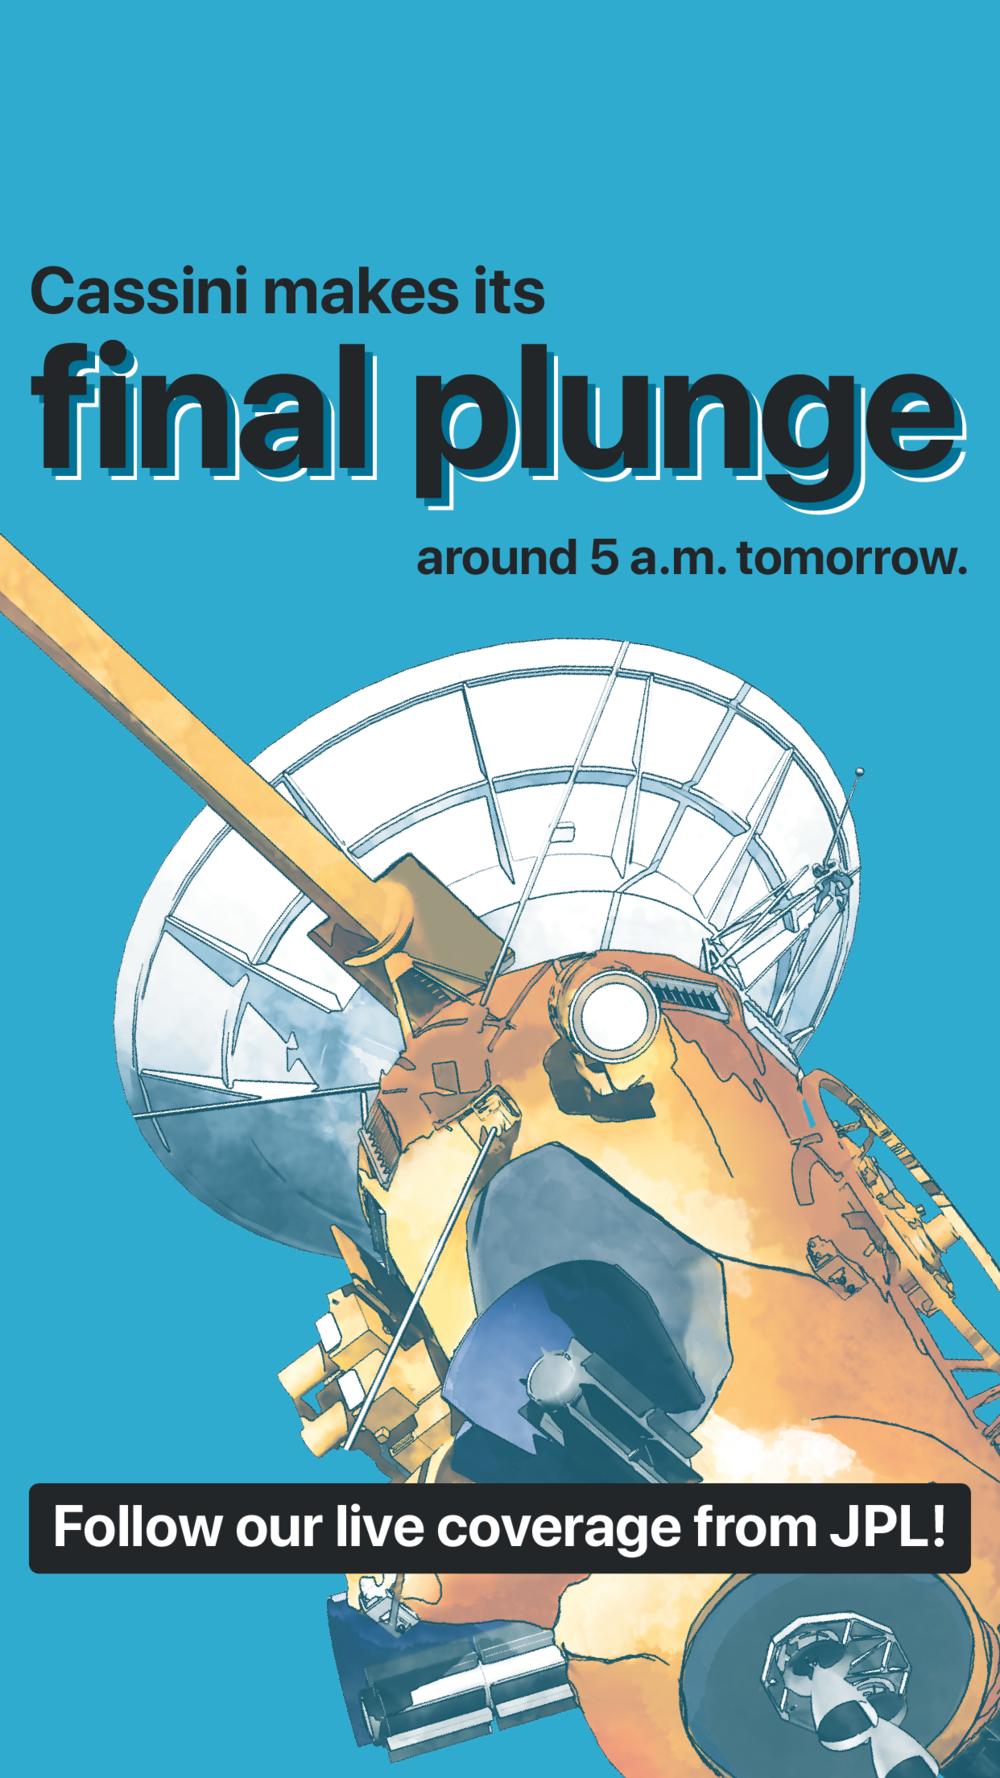 Cassini IG Story 08.png